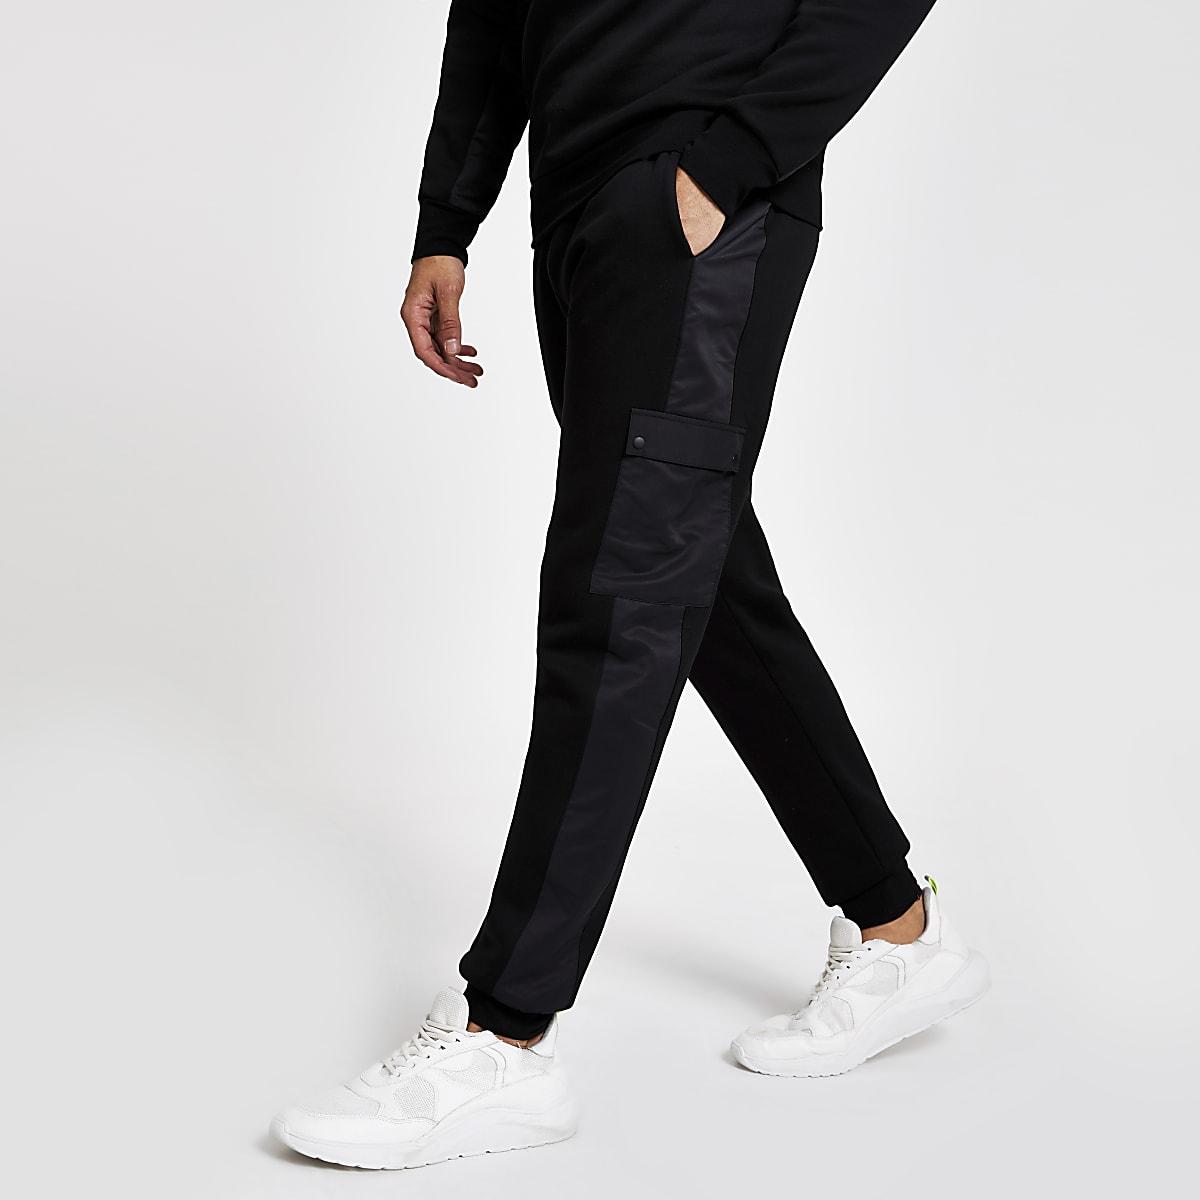 Black slim fit utility joggers